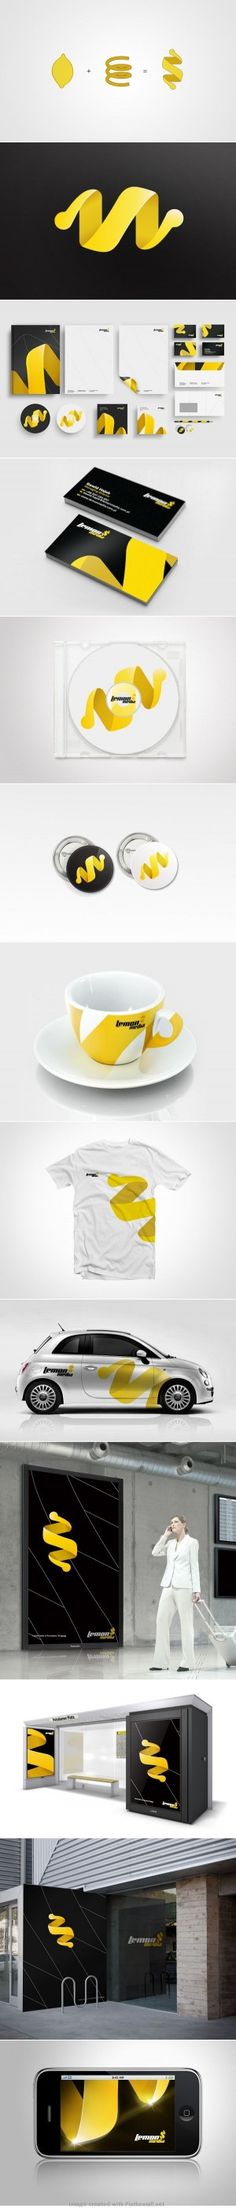 Lemon Media brand identity – Design inspiration